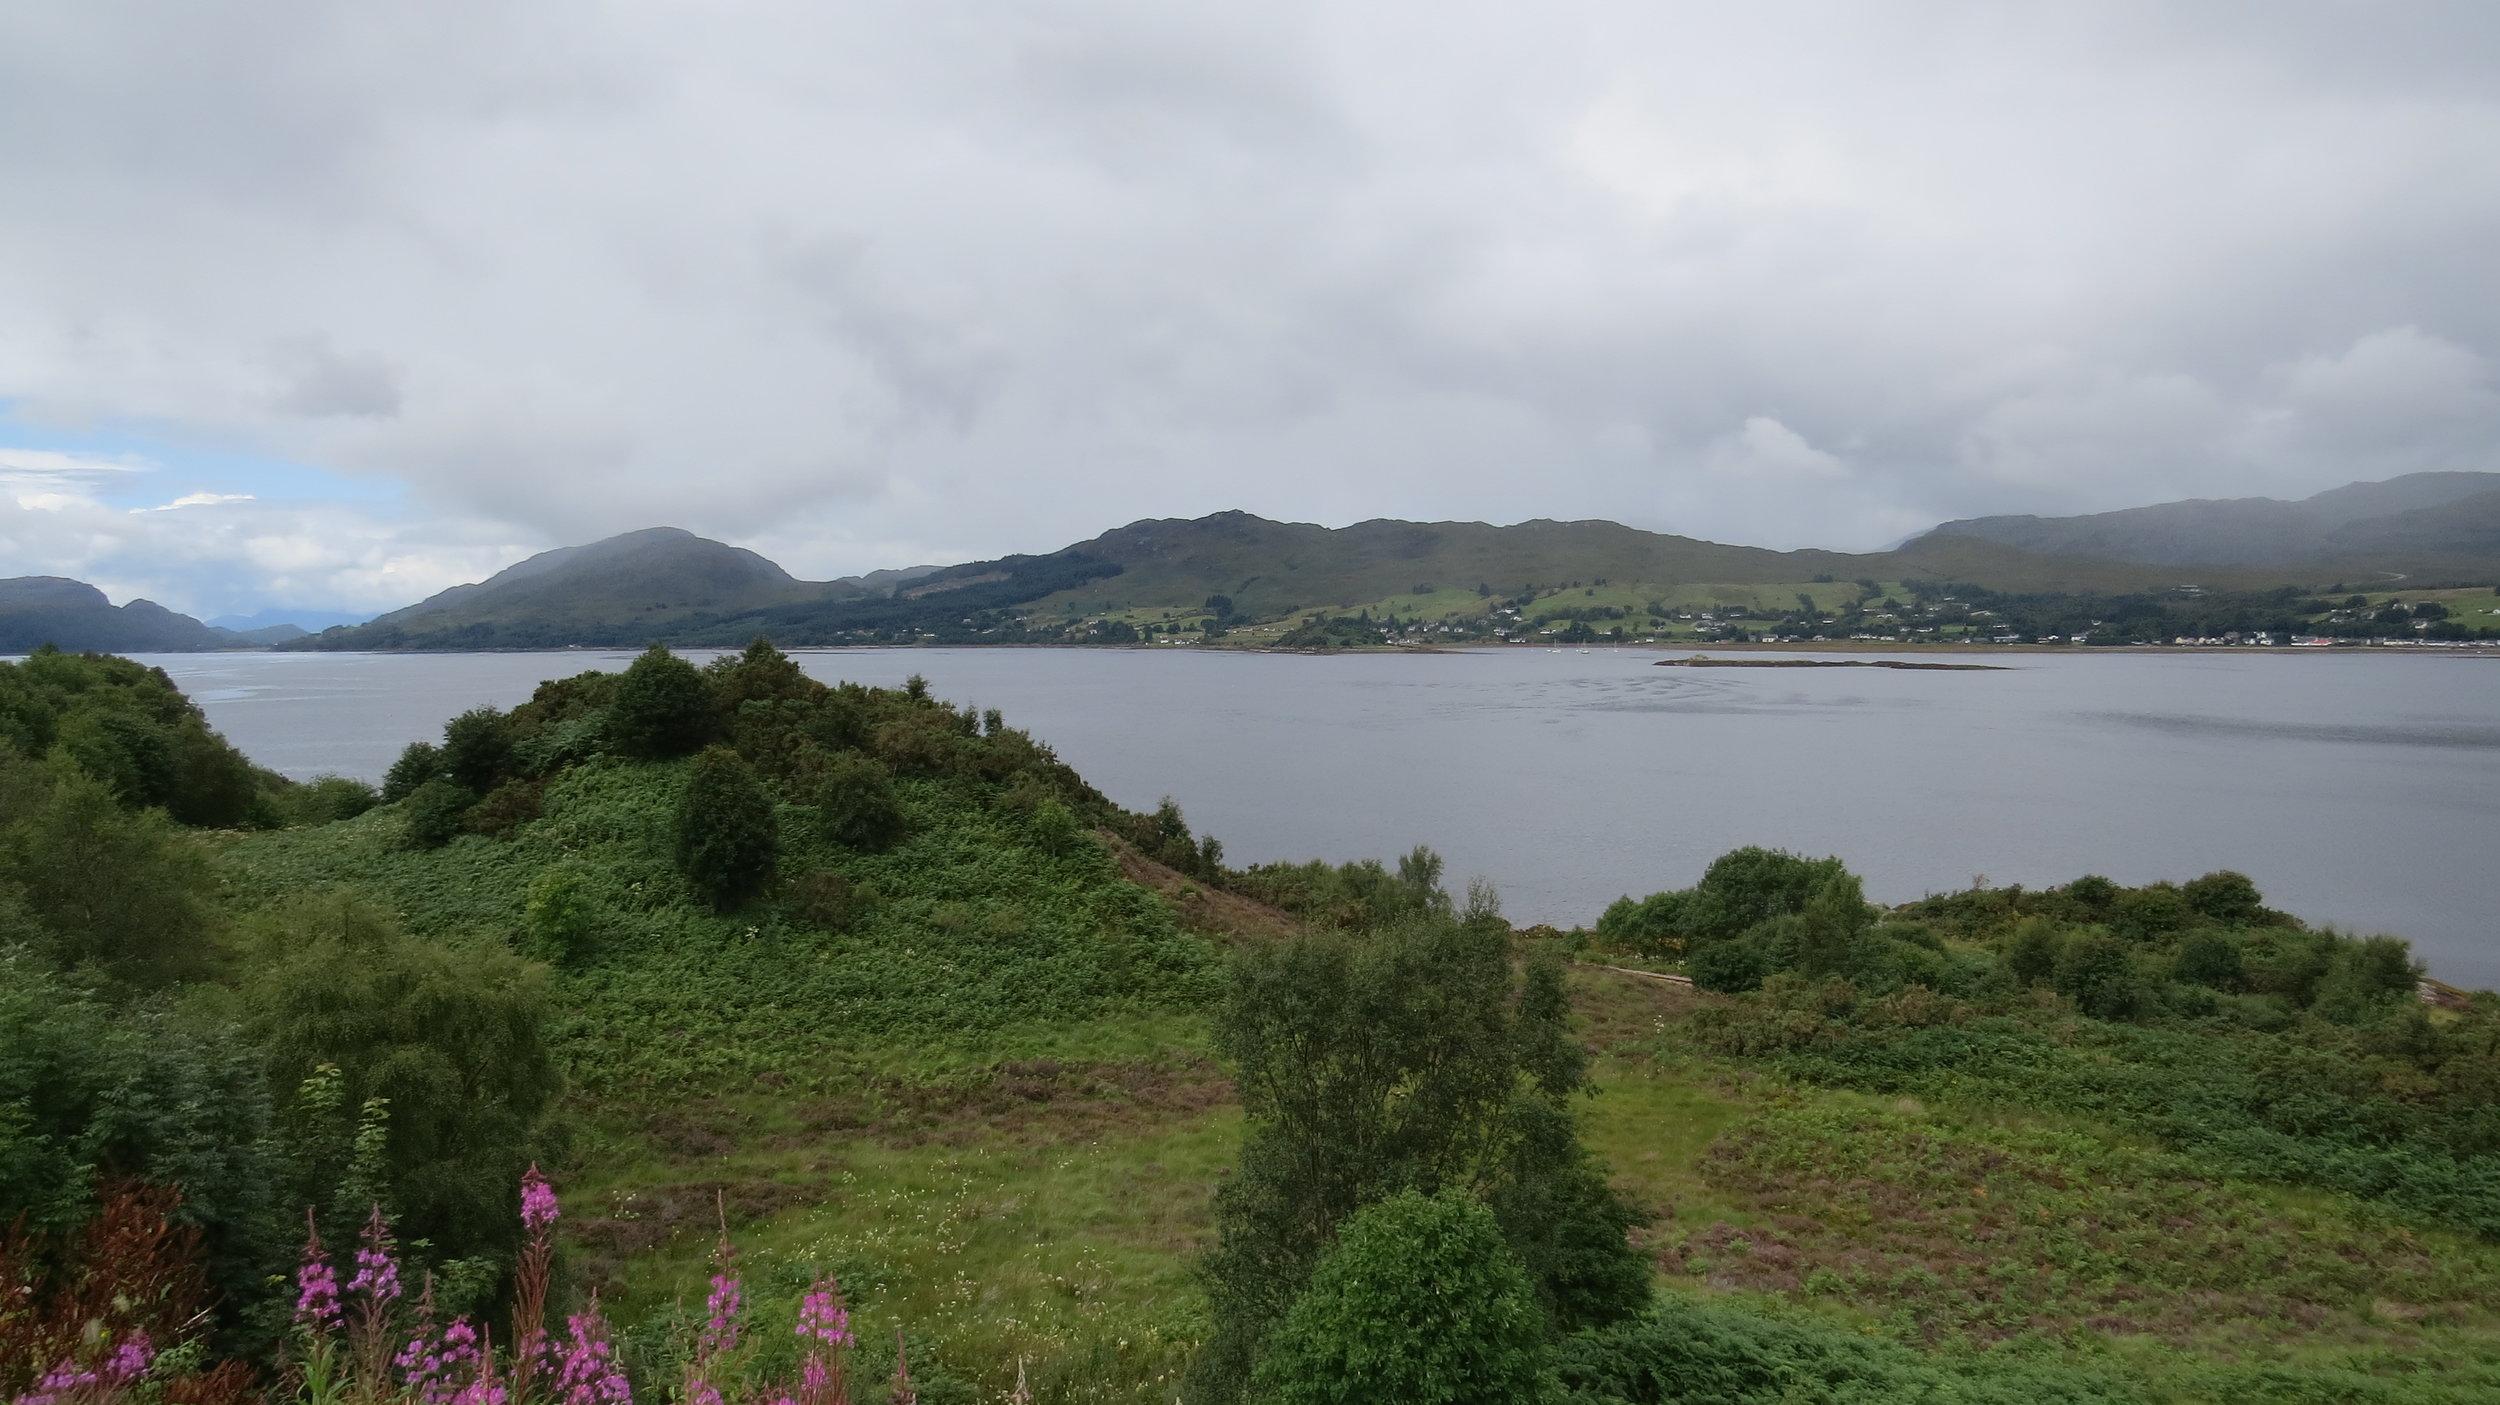 View down Loch Carron